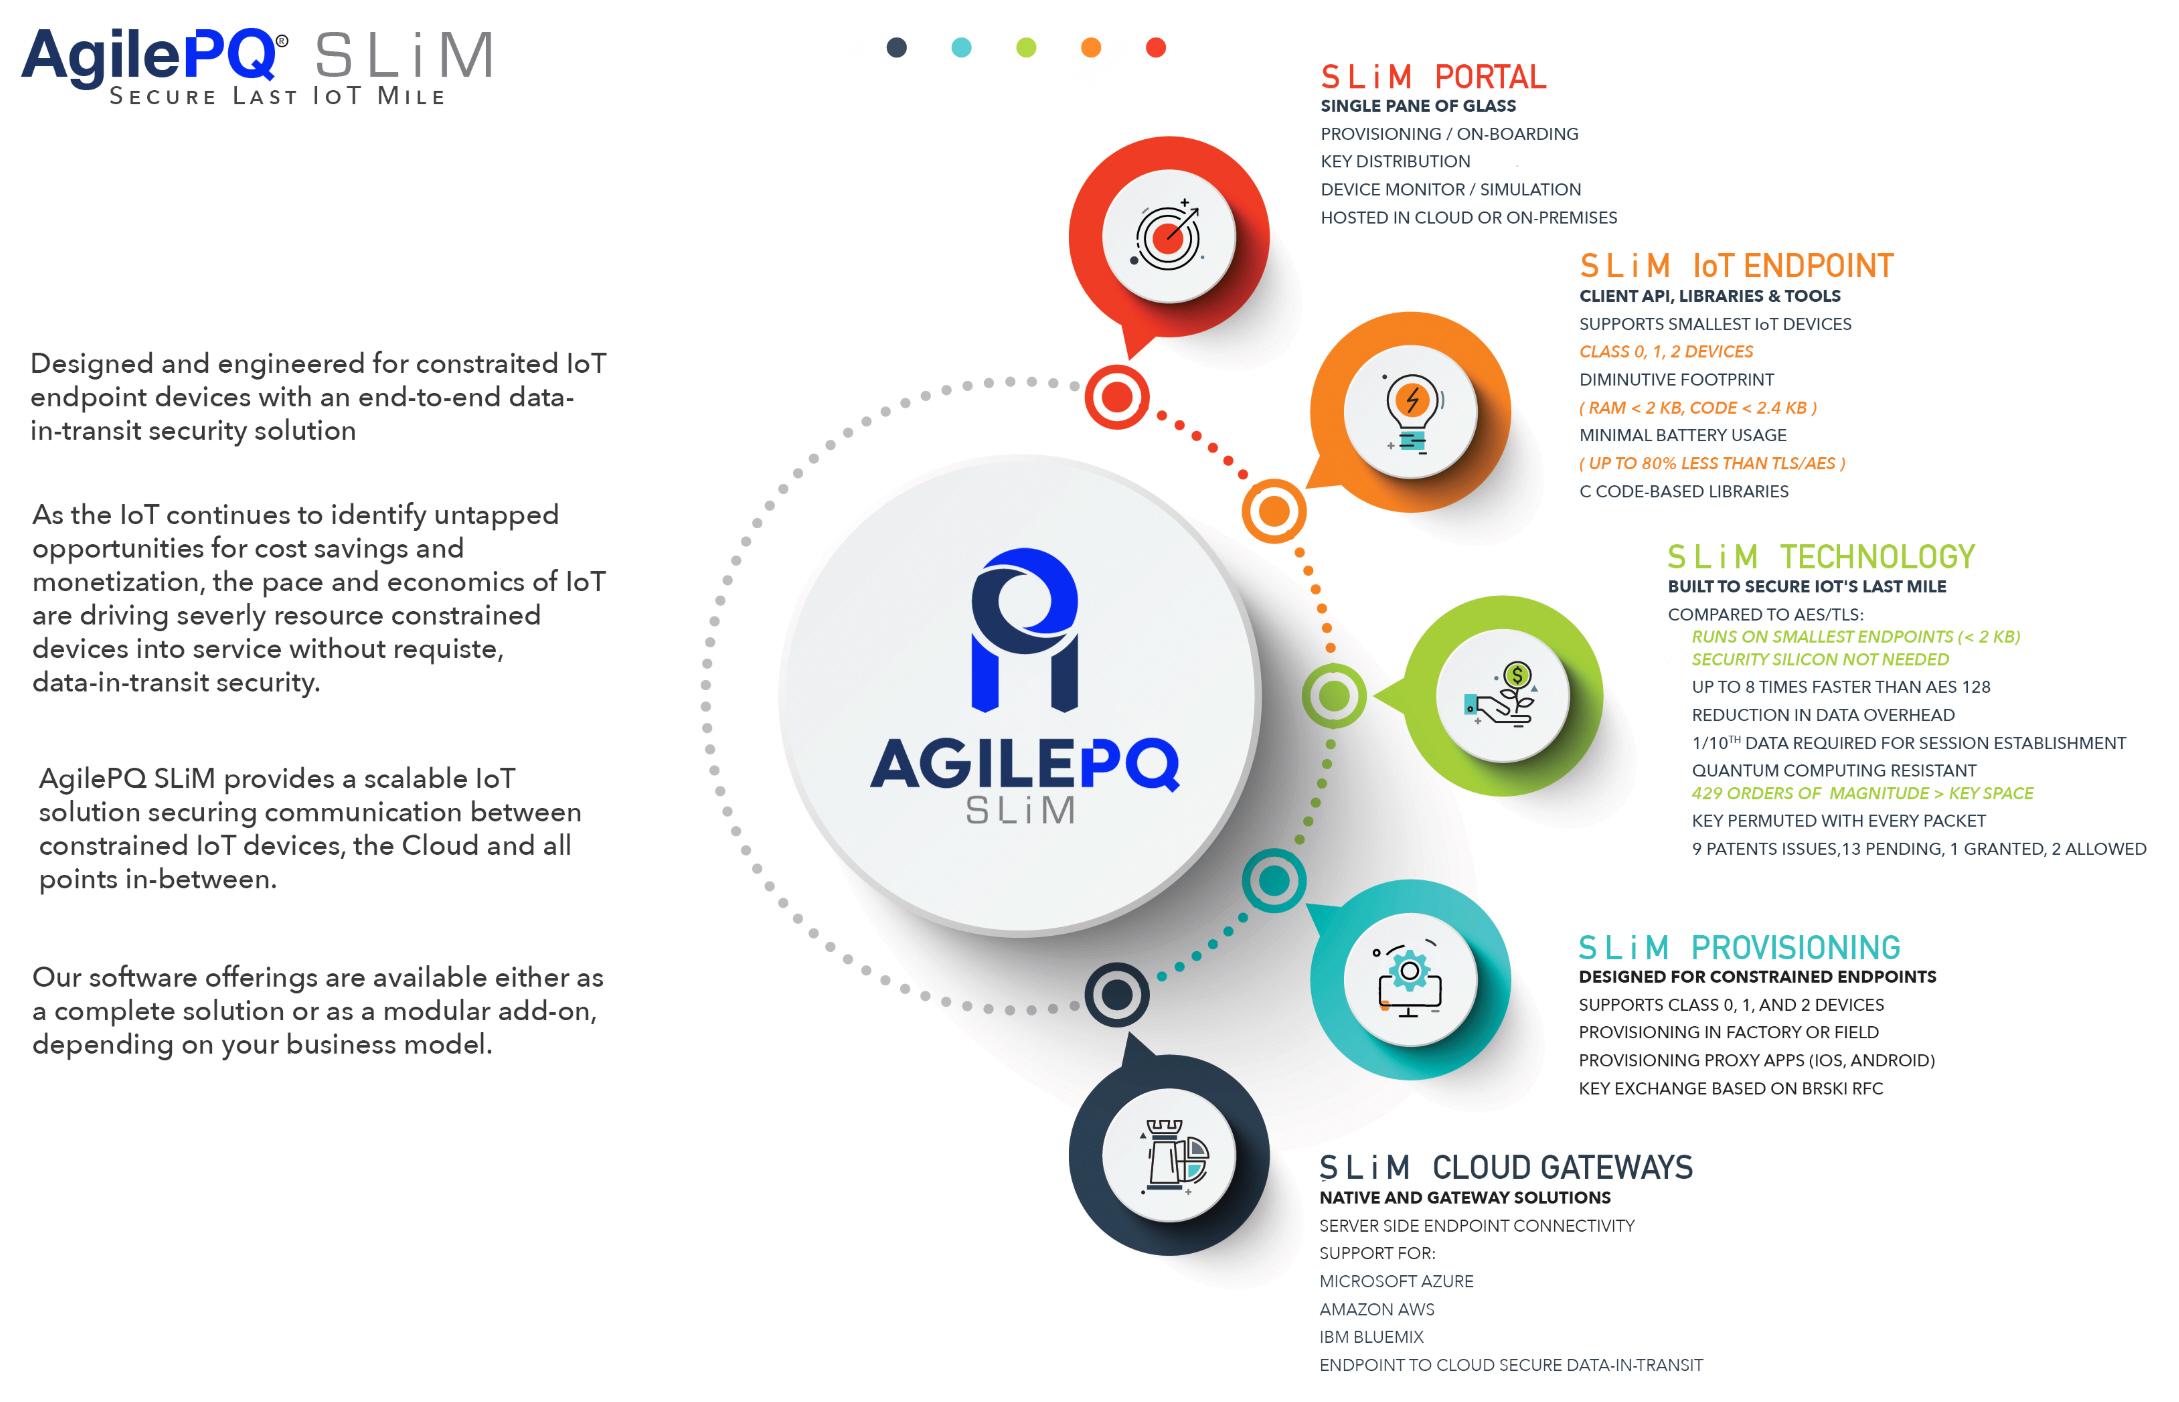 AgilePQ: Media Snippet